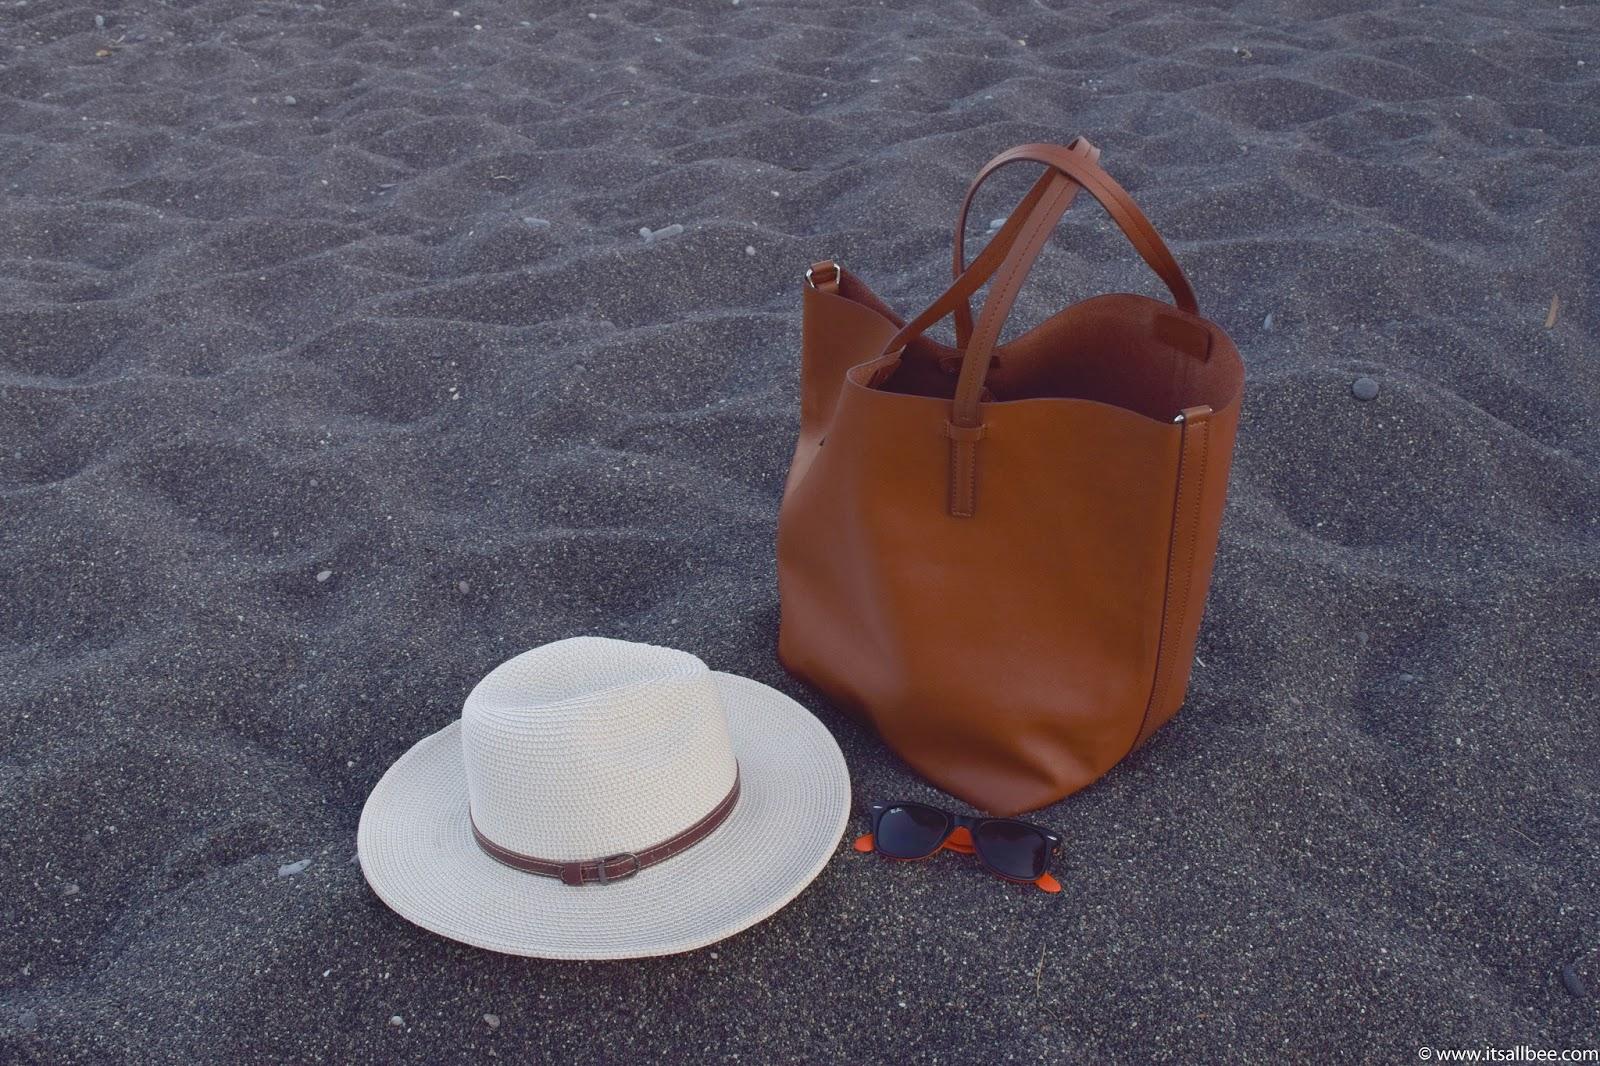 santorini black beach | Guide To The Best of Santorini Beaches